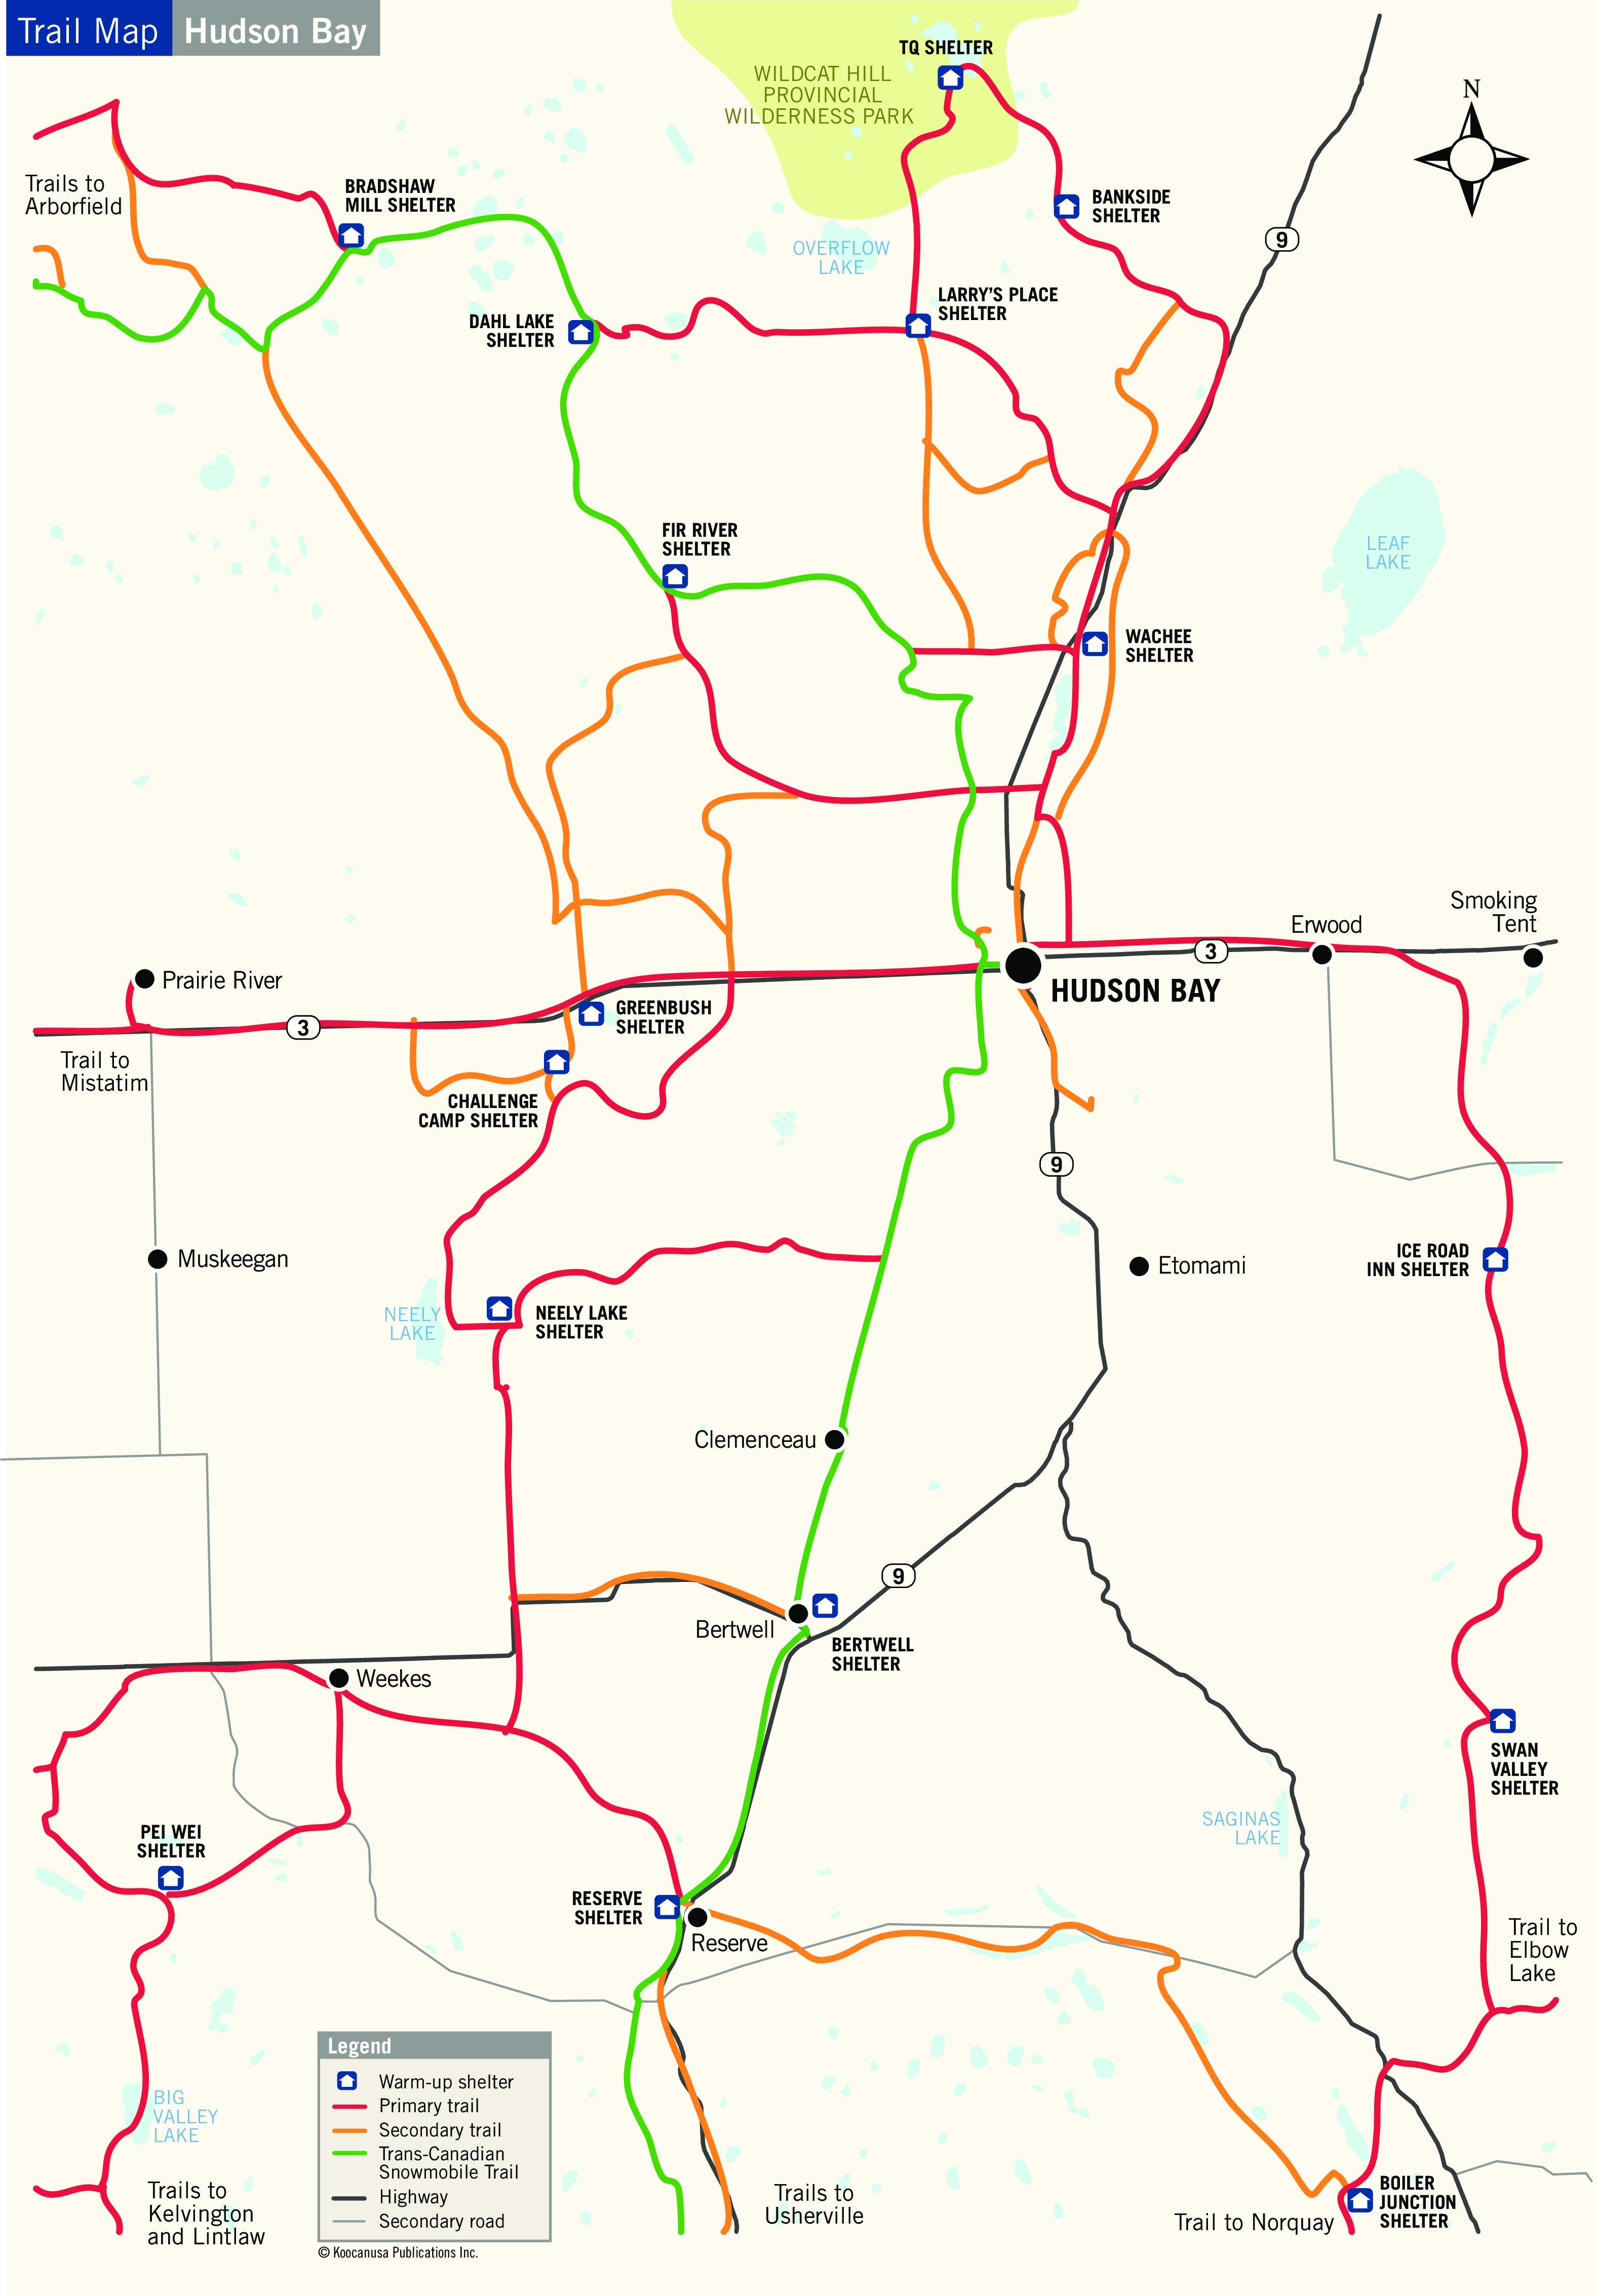 Hudson Bay, SK snowmobile trip planner | SnoRiders